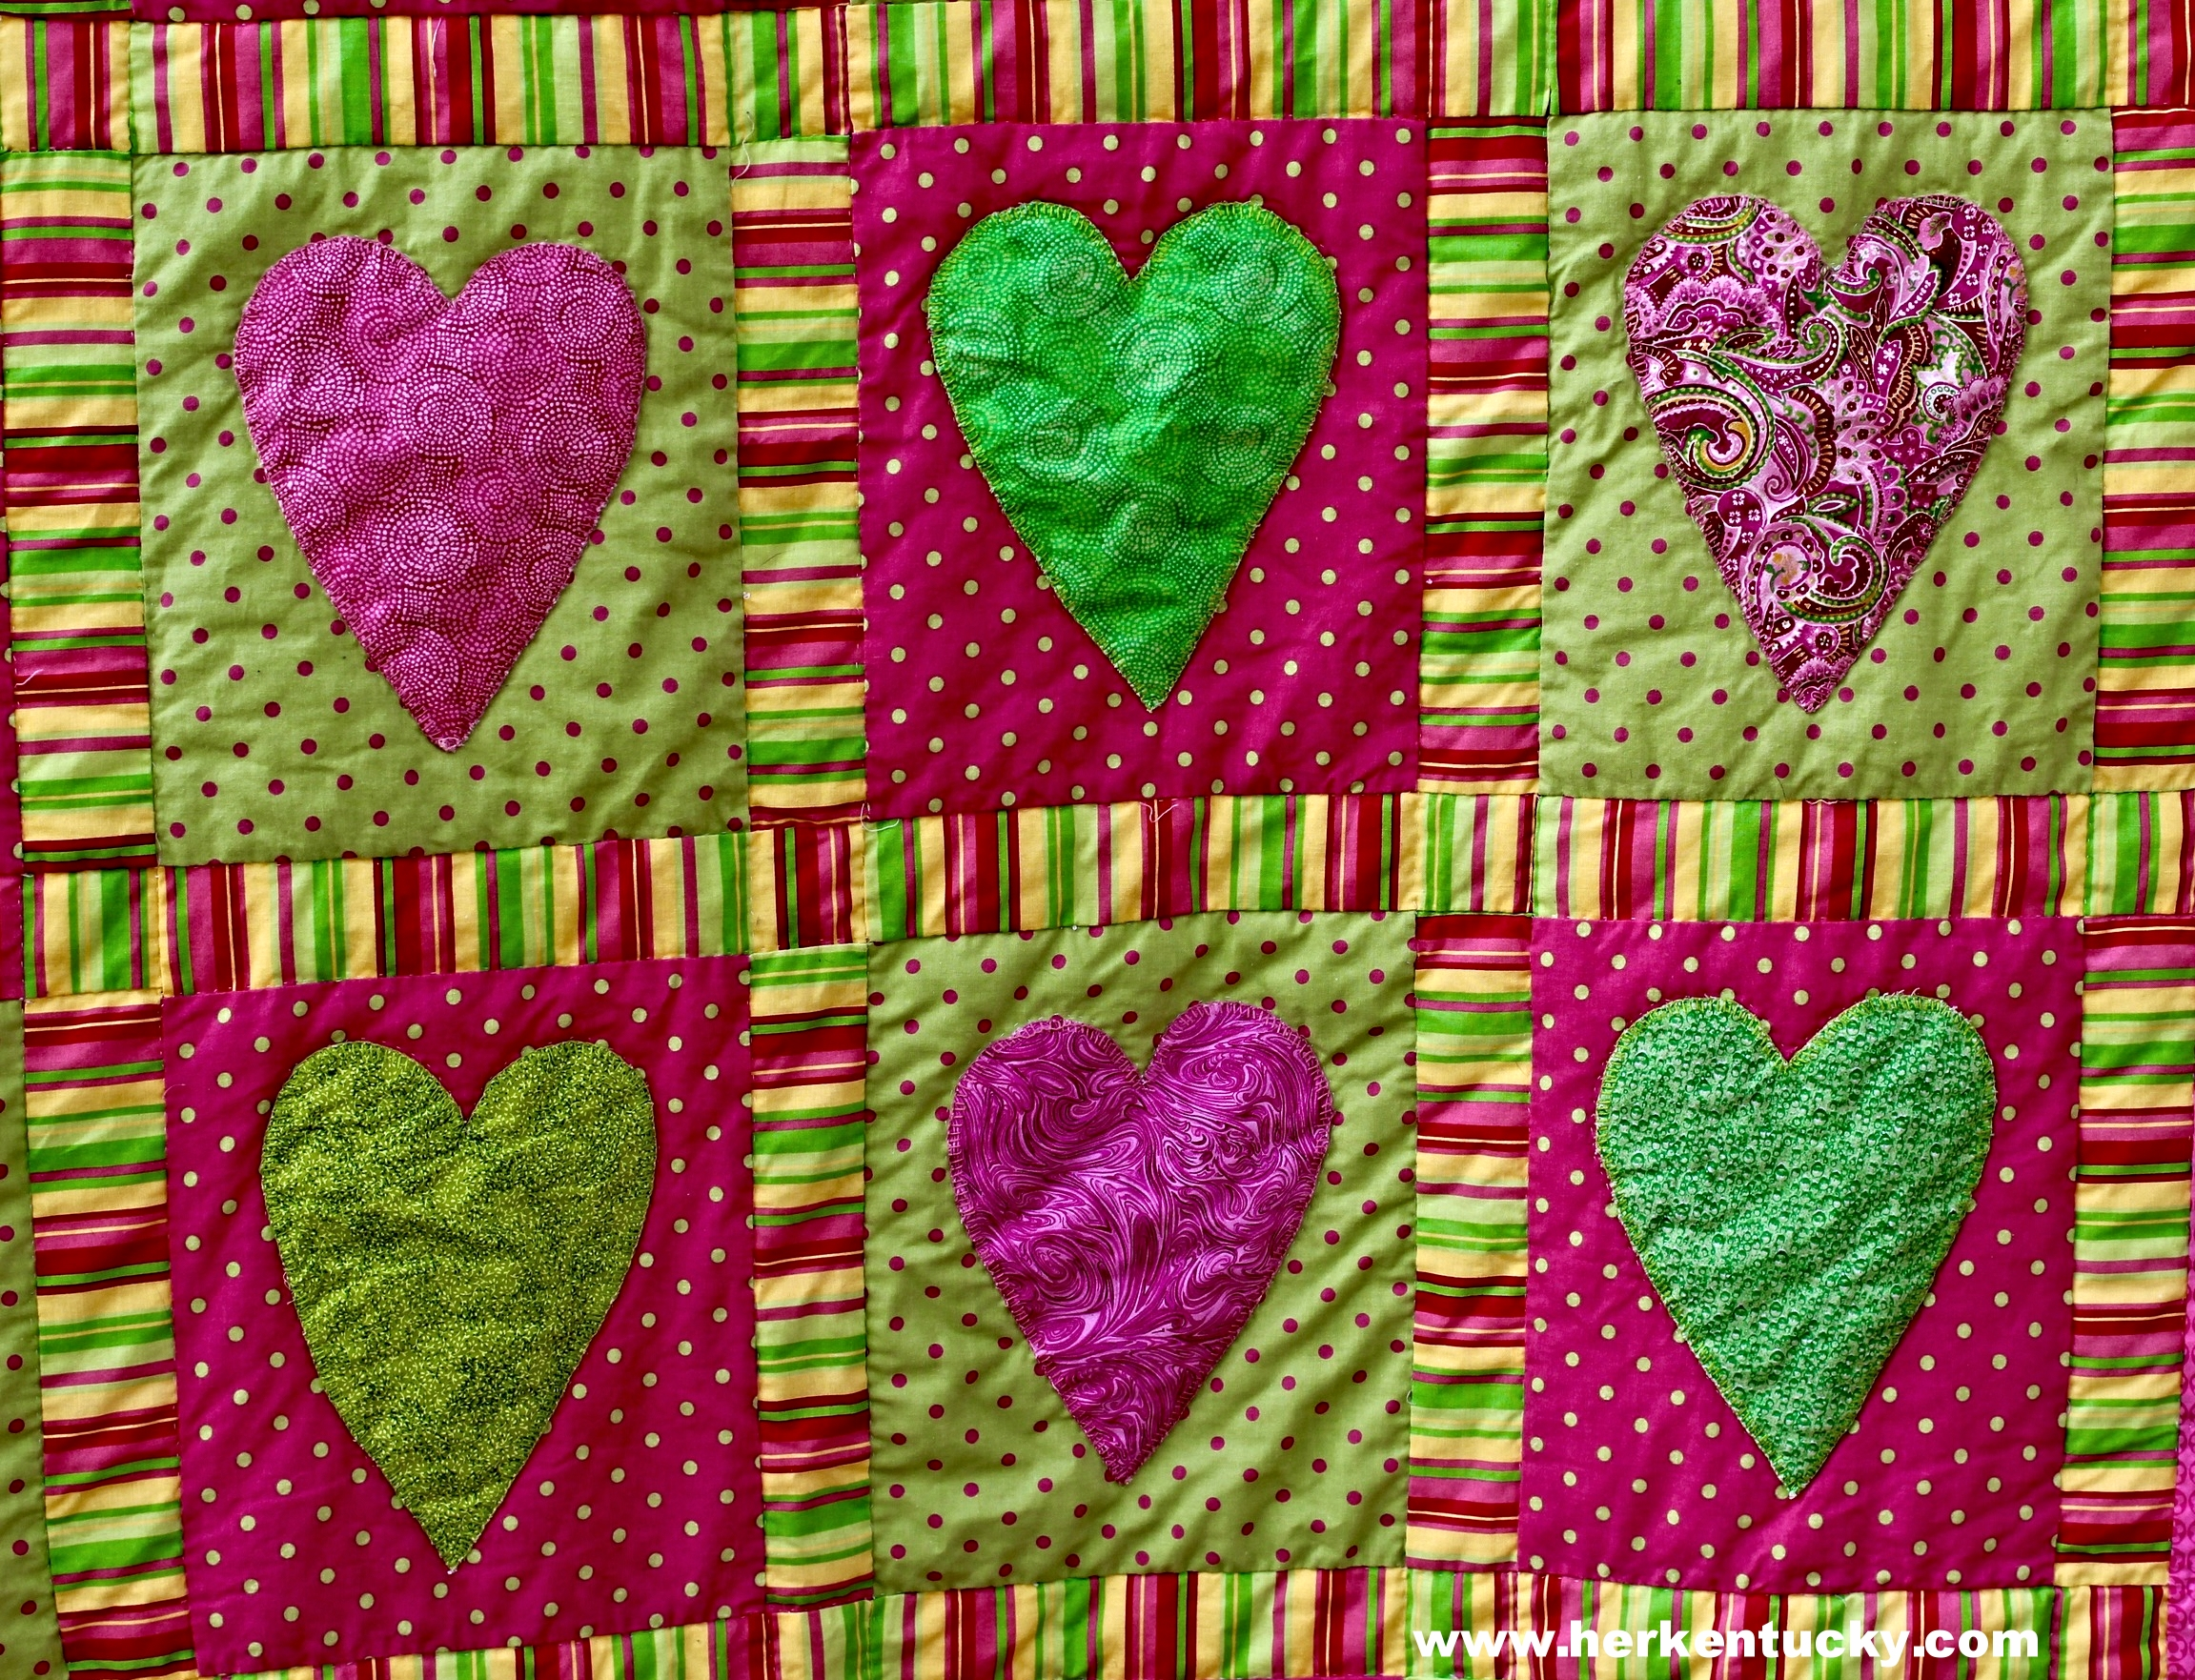 Pink + Green Hearts + Polka Dots Quilt